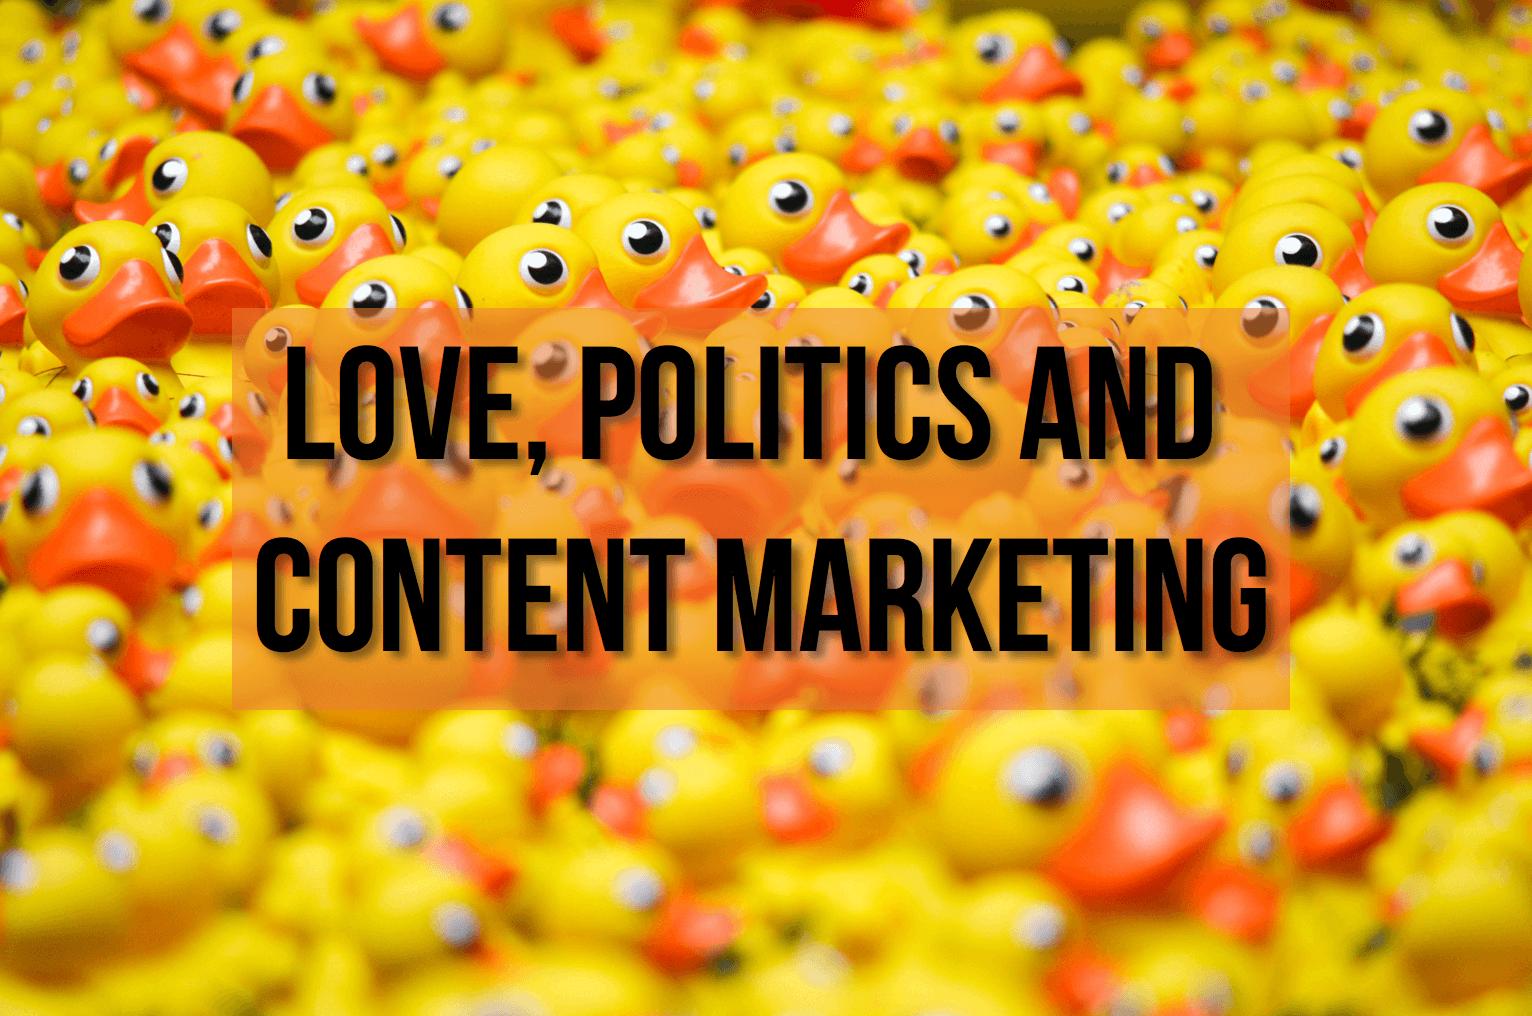 politics and content marketing